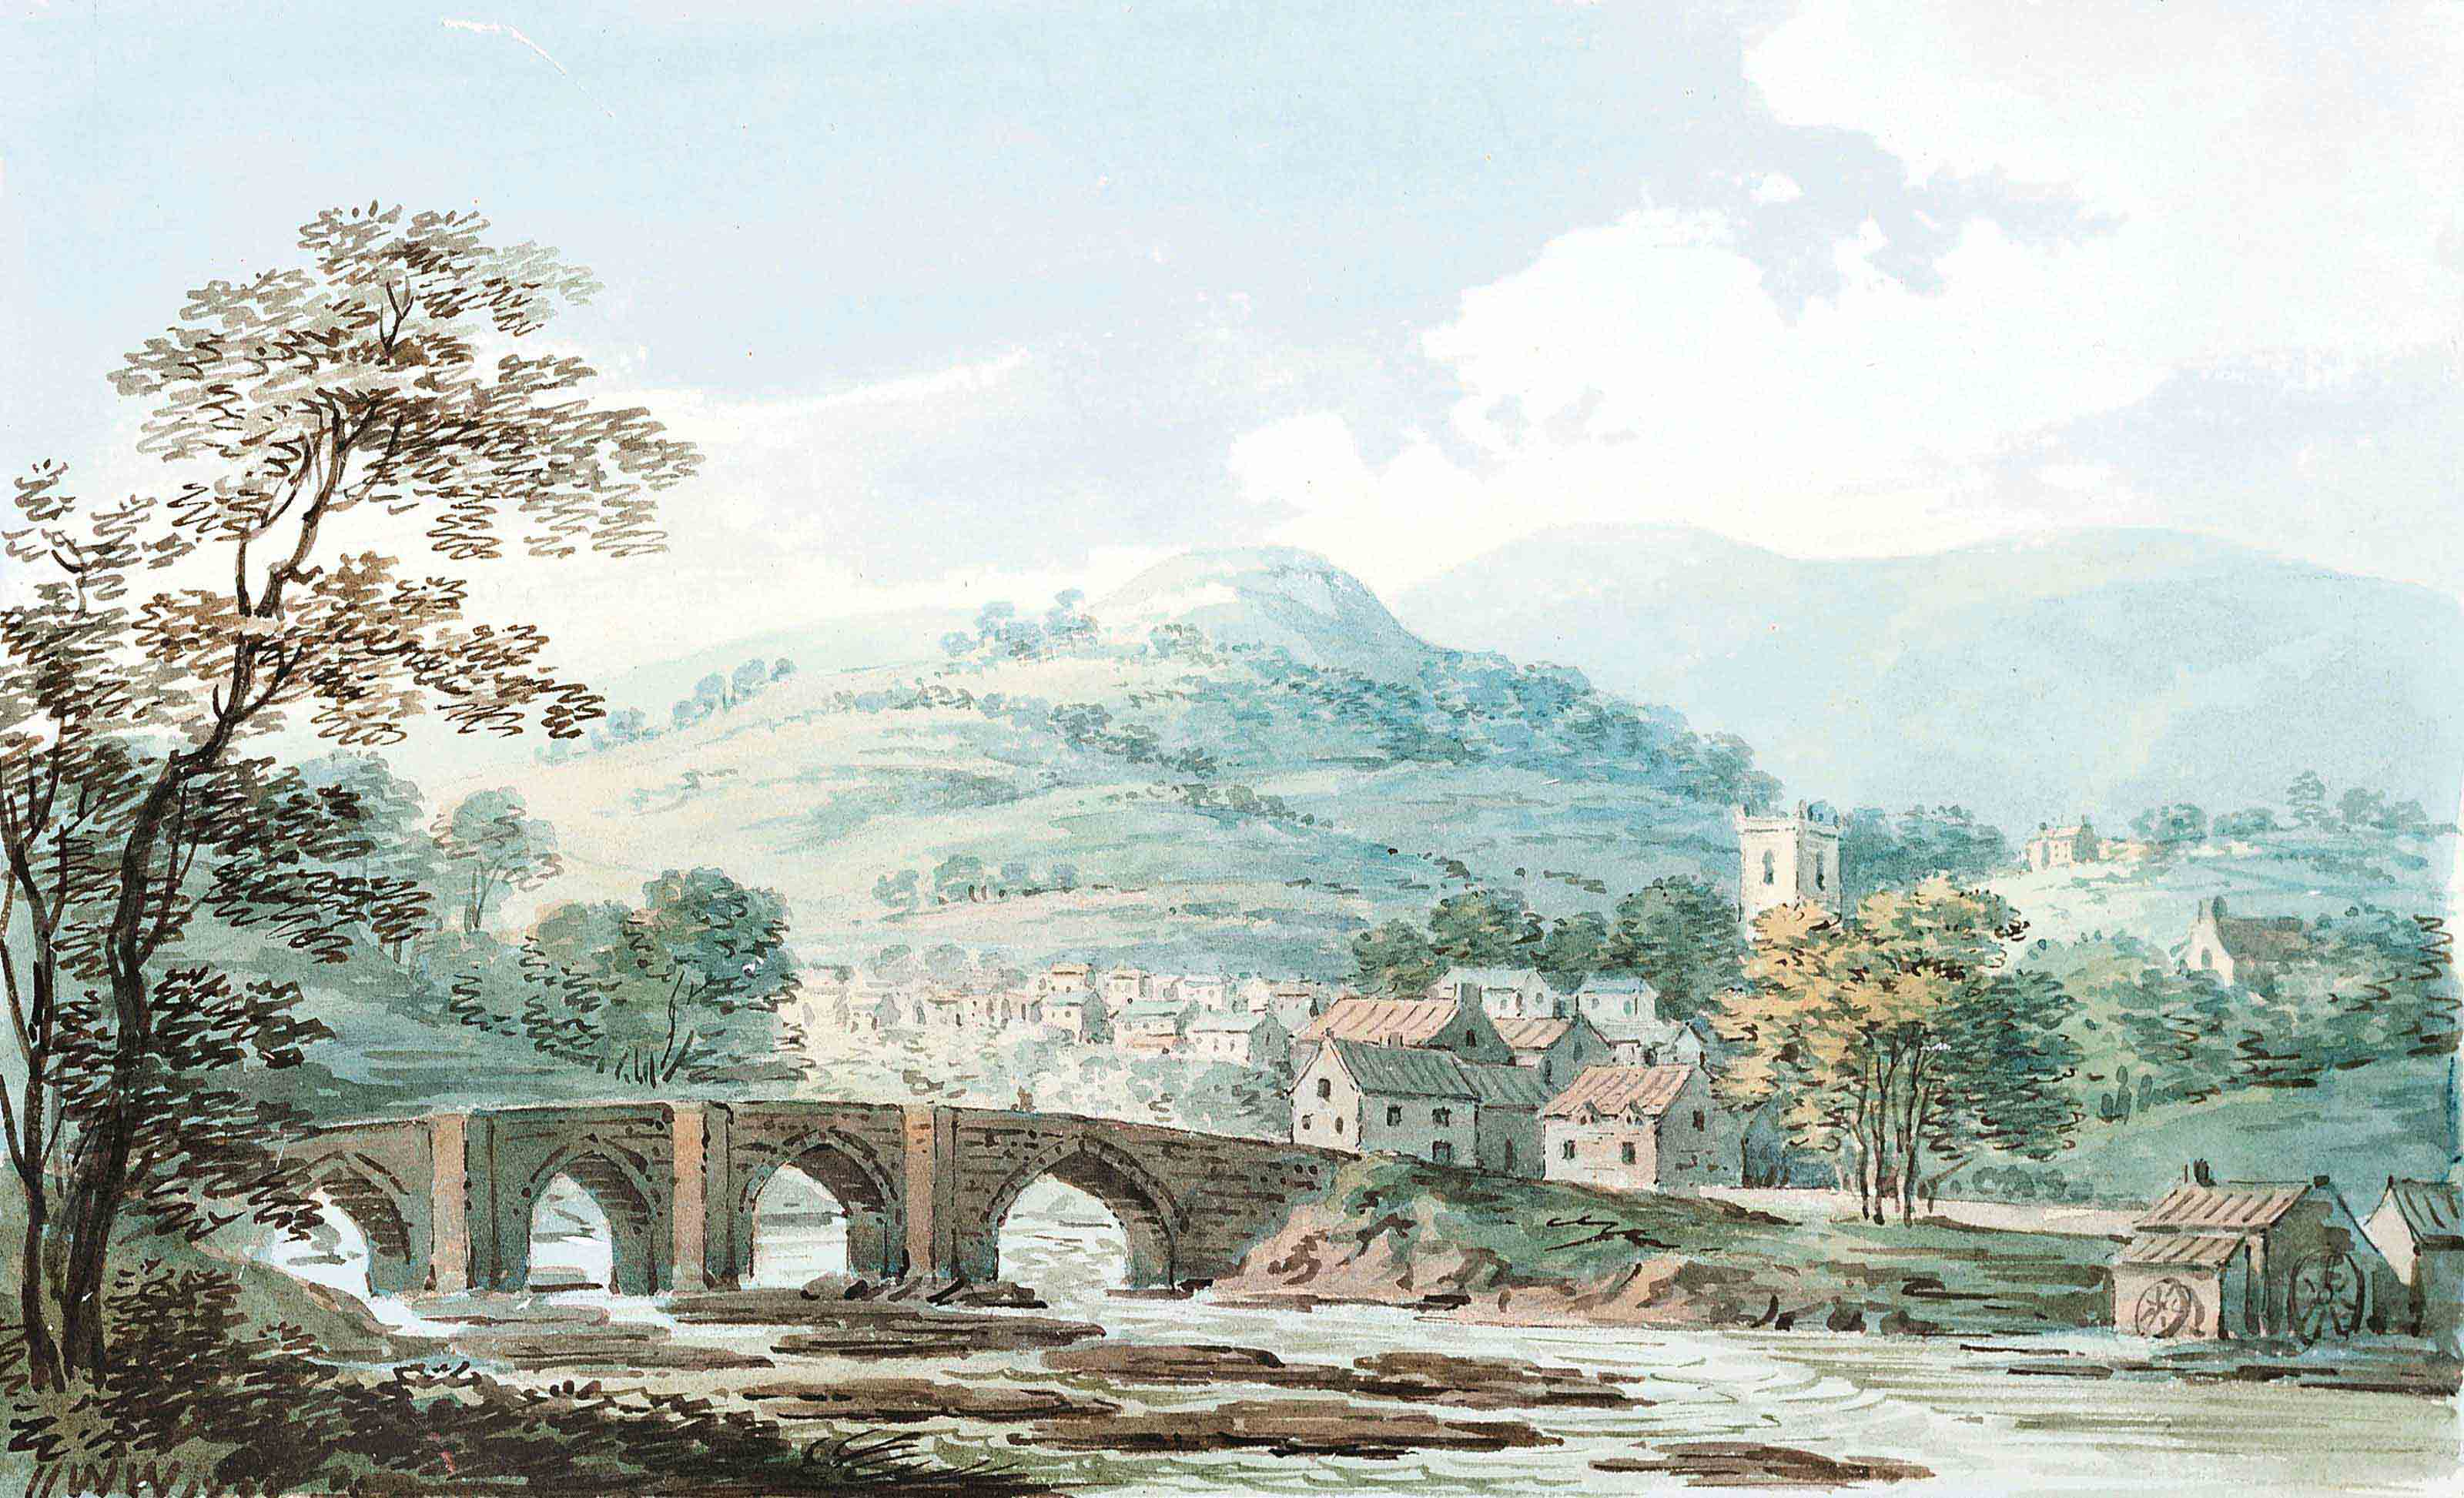 Hugh William 'Grecian' Williams (1773-1829)